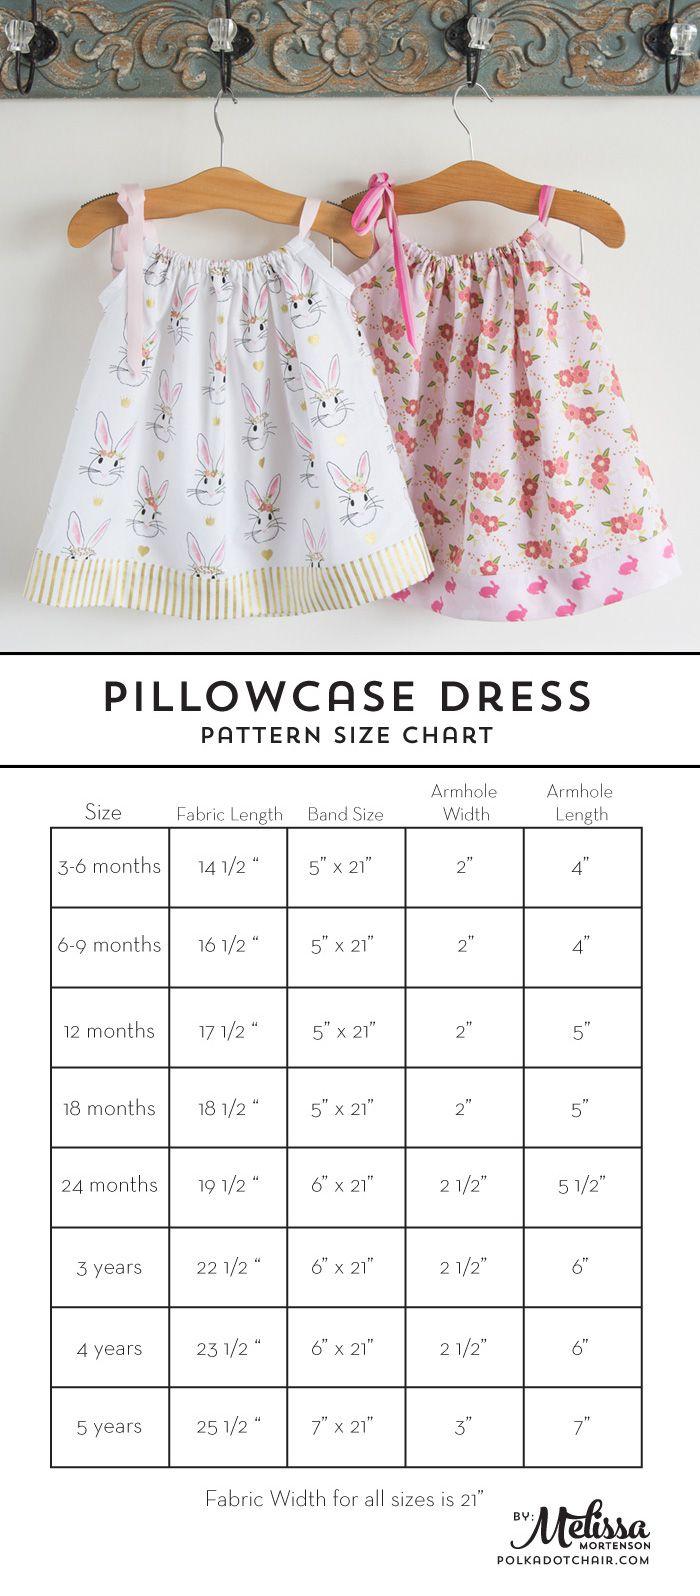 armhole template for pillowcase dress.html